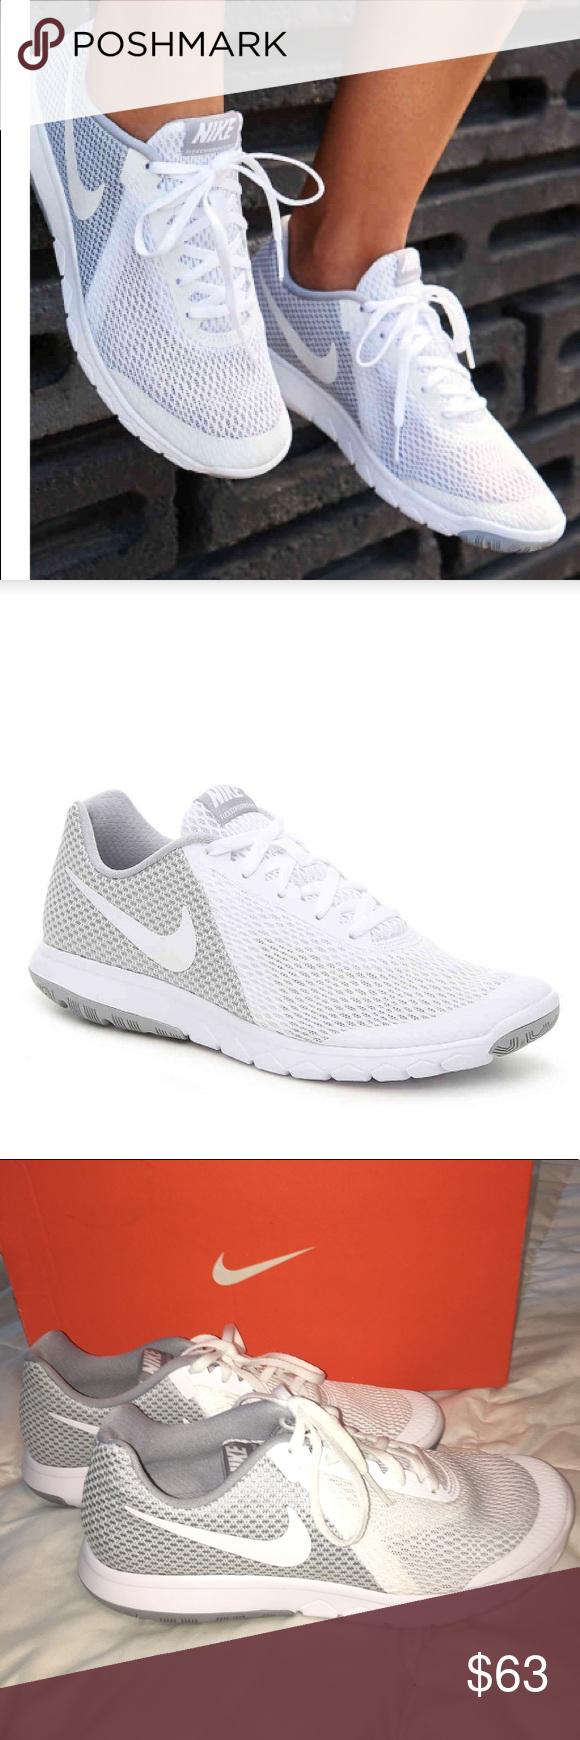 New Nike Flex Trainer 6 Women's size 8